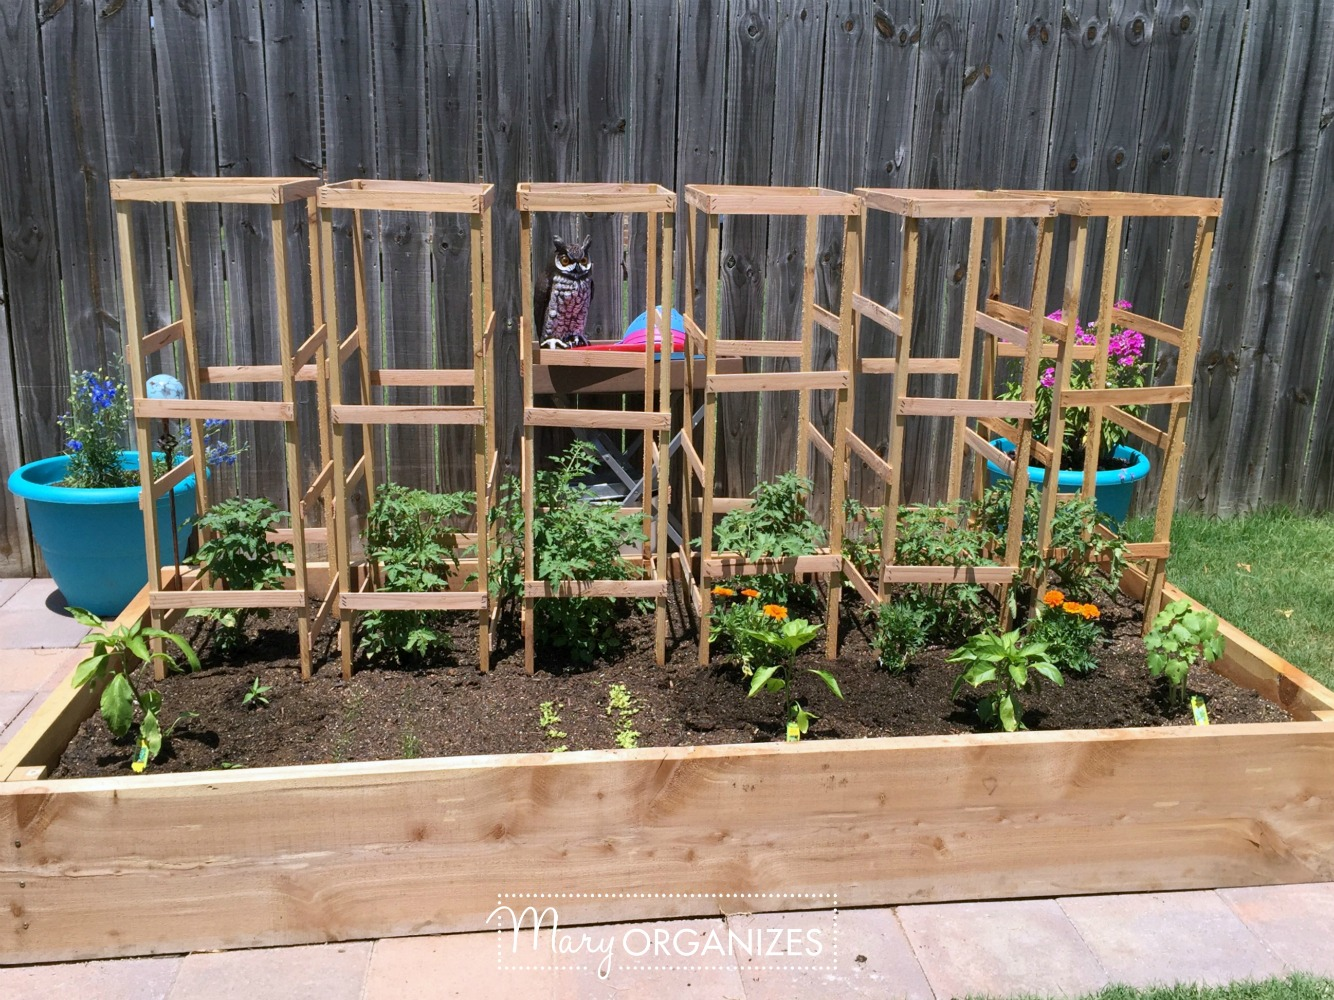 DIY Tomato Cage Tutorial for the Organic Garden 5